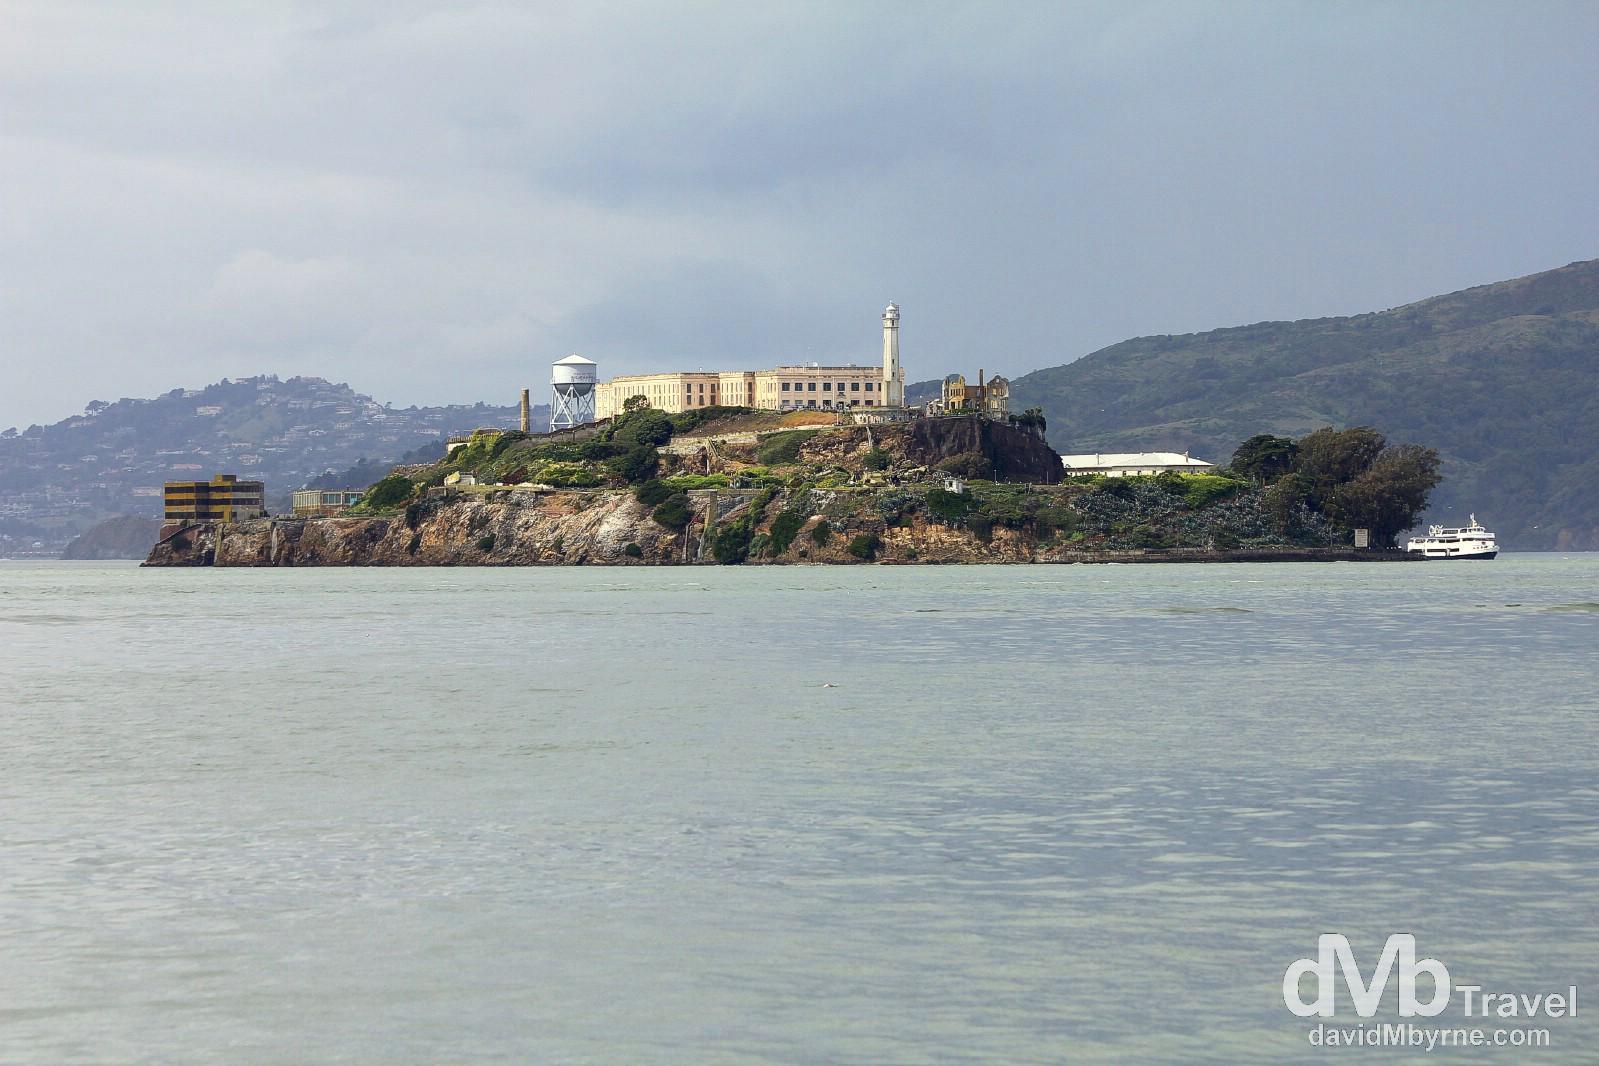 Alcatraz island as seen from the waterfront near Fisherman's Wharf, San Francisco, California, USA. March 31st 2013.